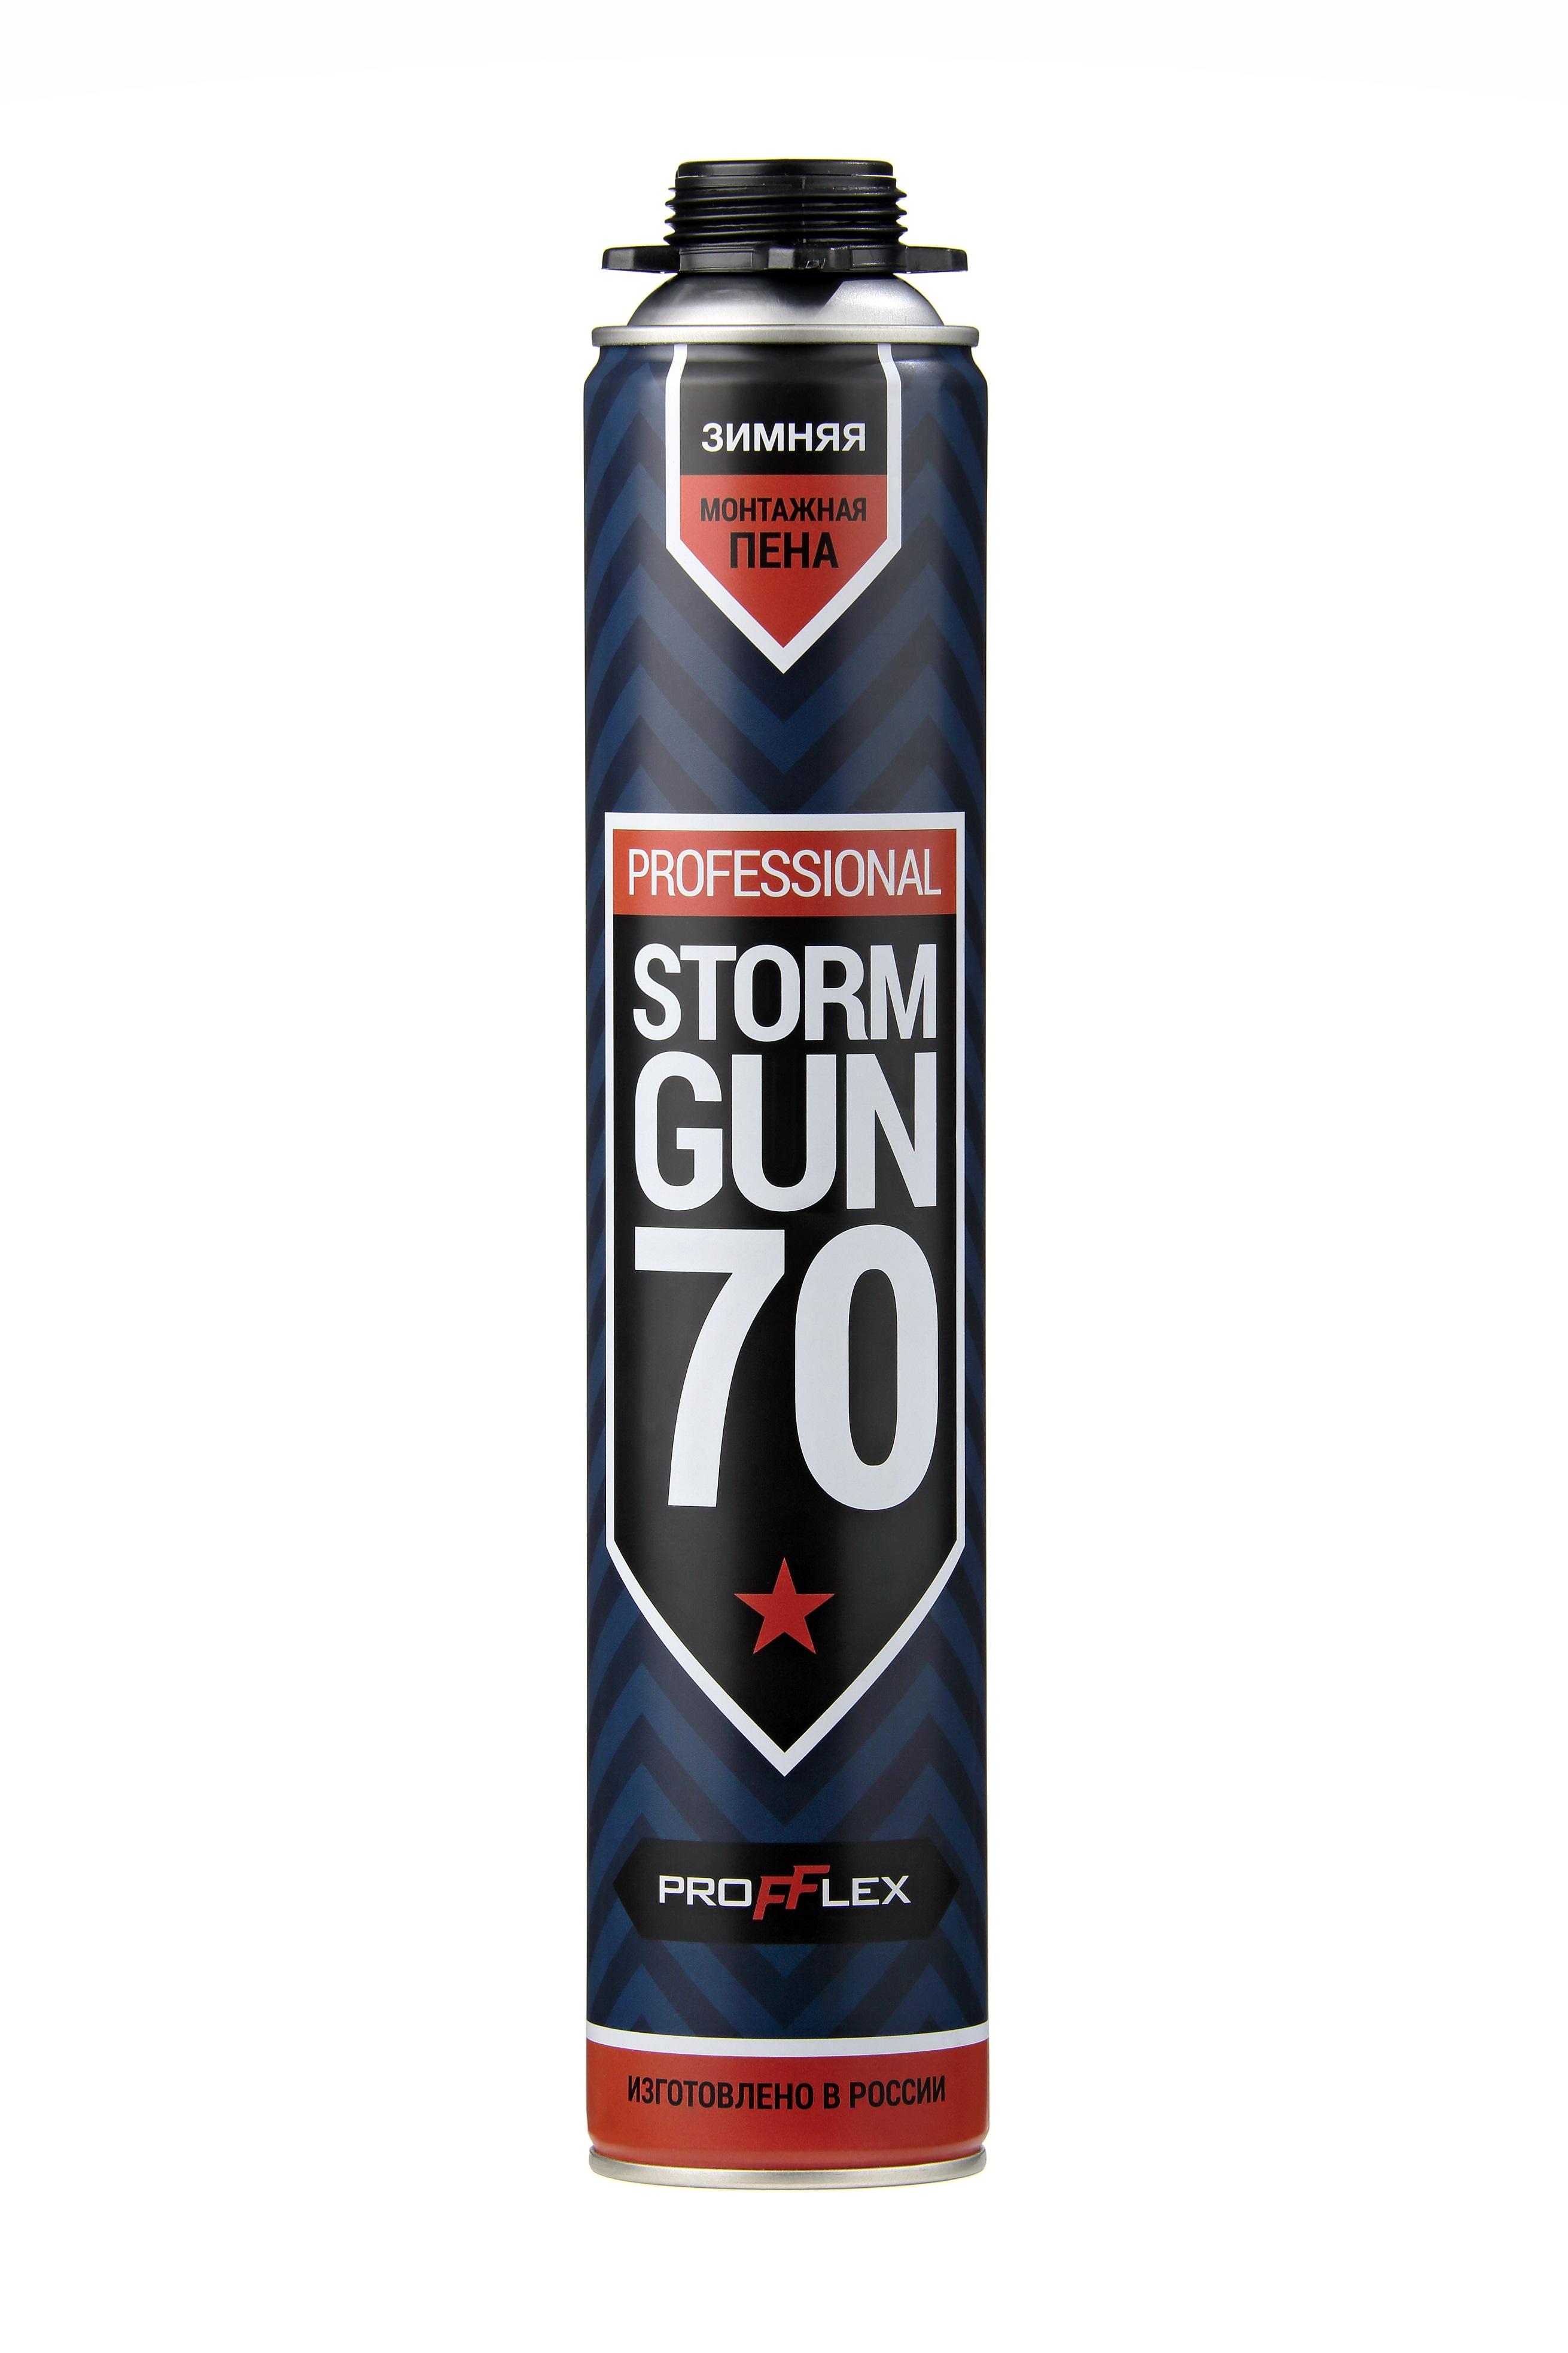 Пена монтажная проф Storm Gun 70л ЗИМА - фото